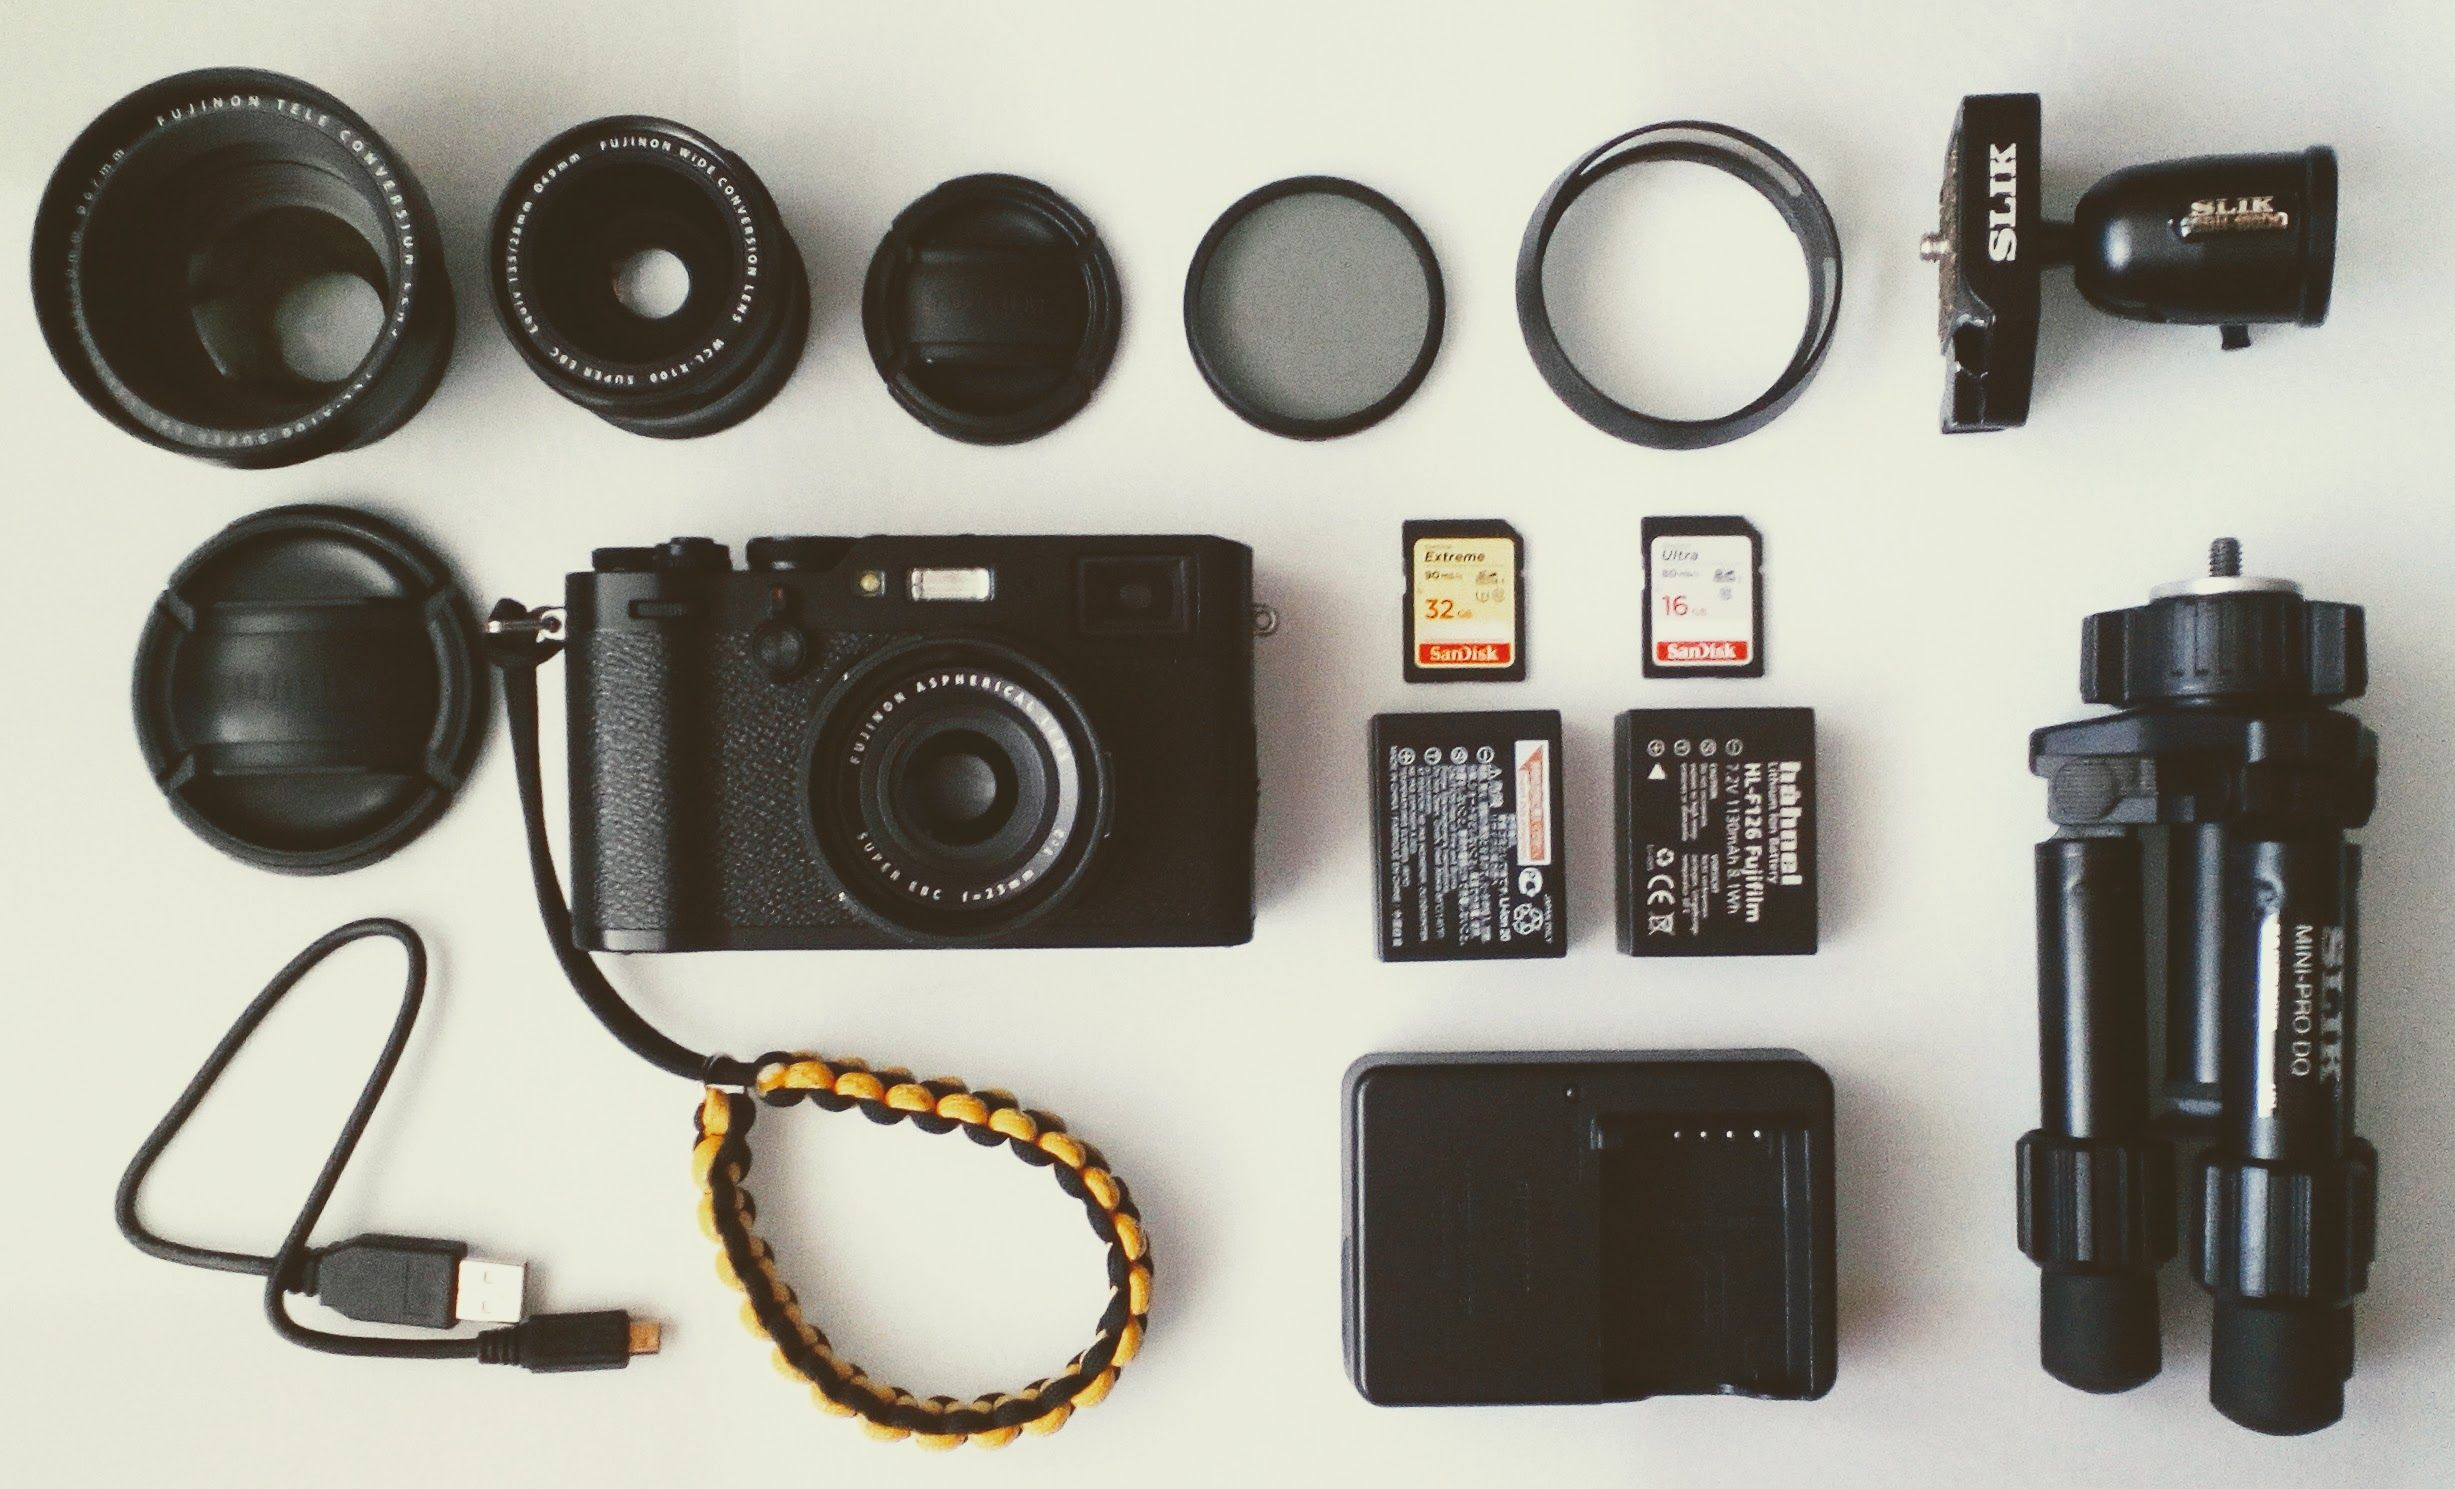 My travel kit